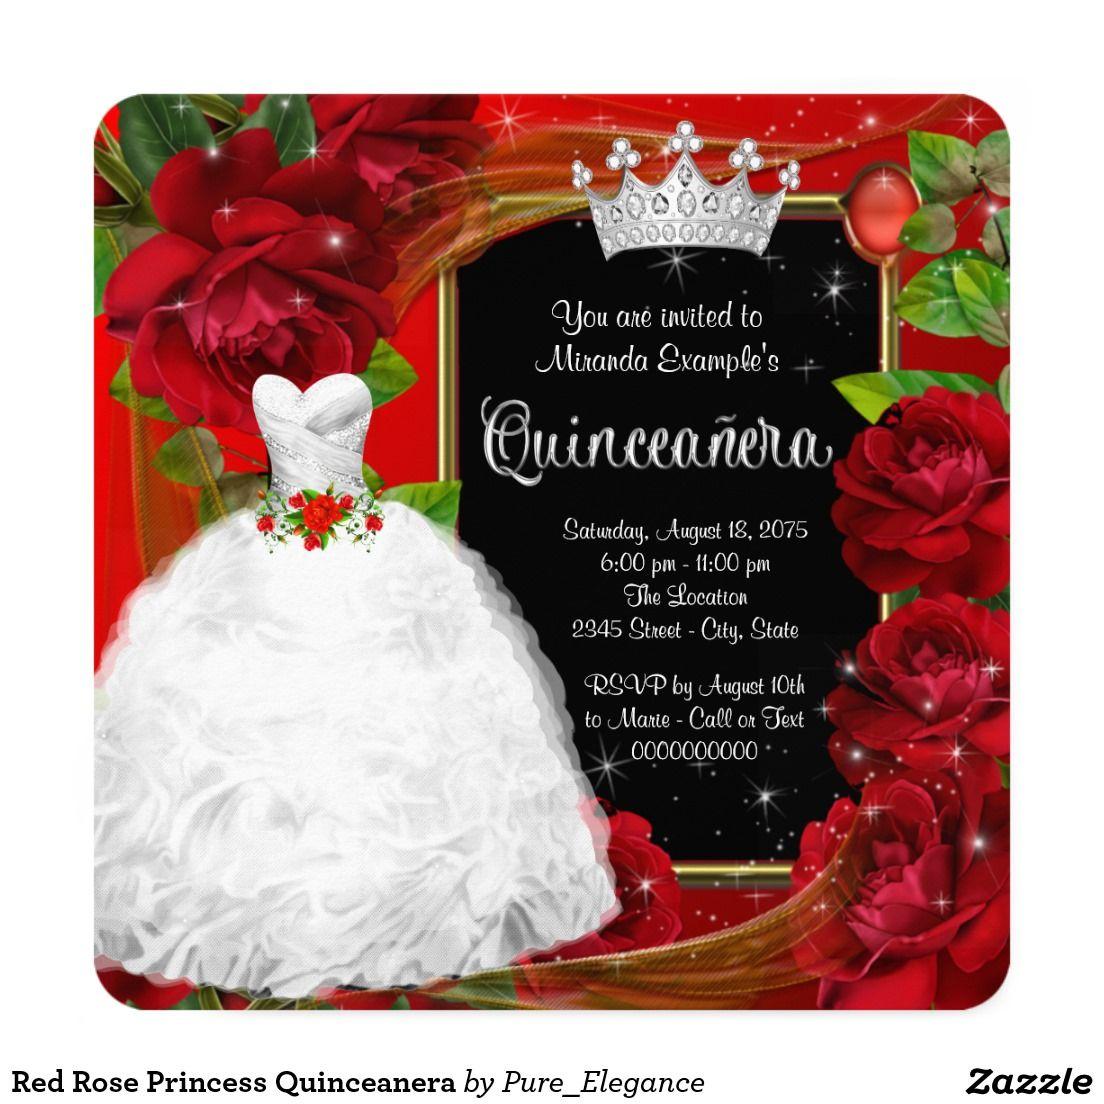 Red Rose Princess Quinceanera Invitation | Quinceañera Invitations ...